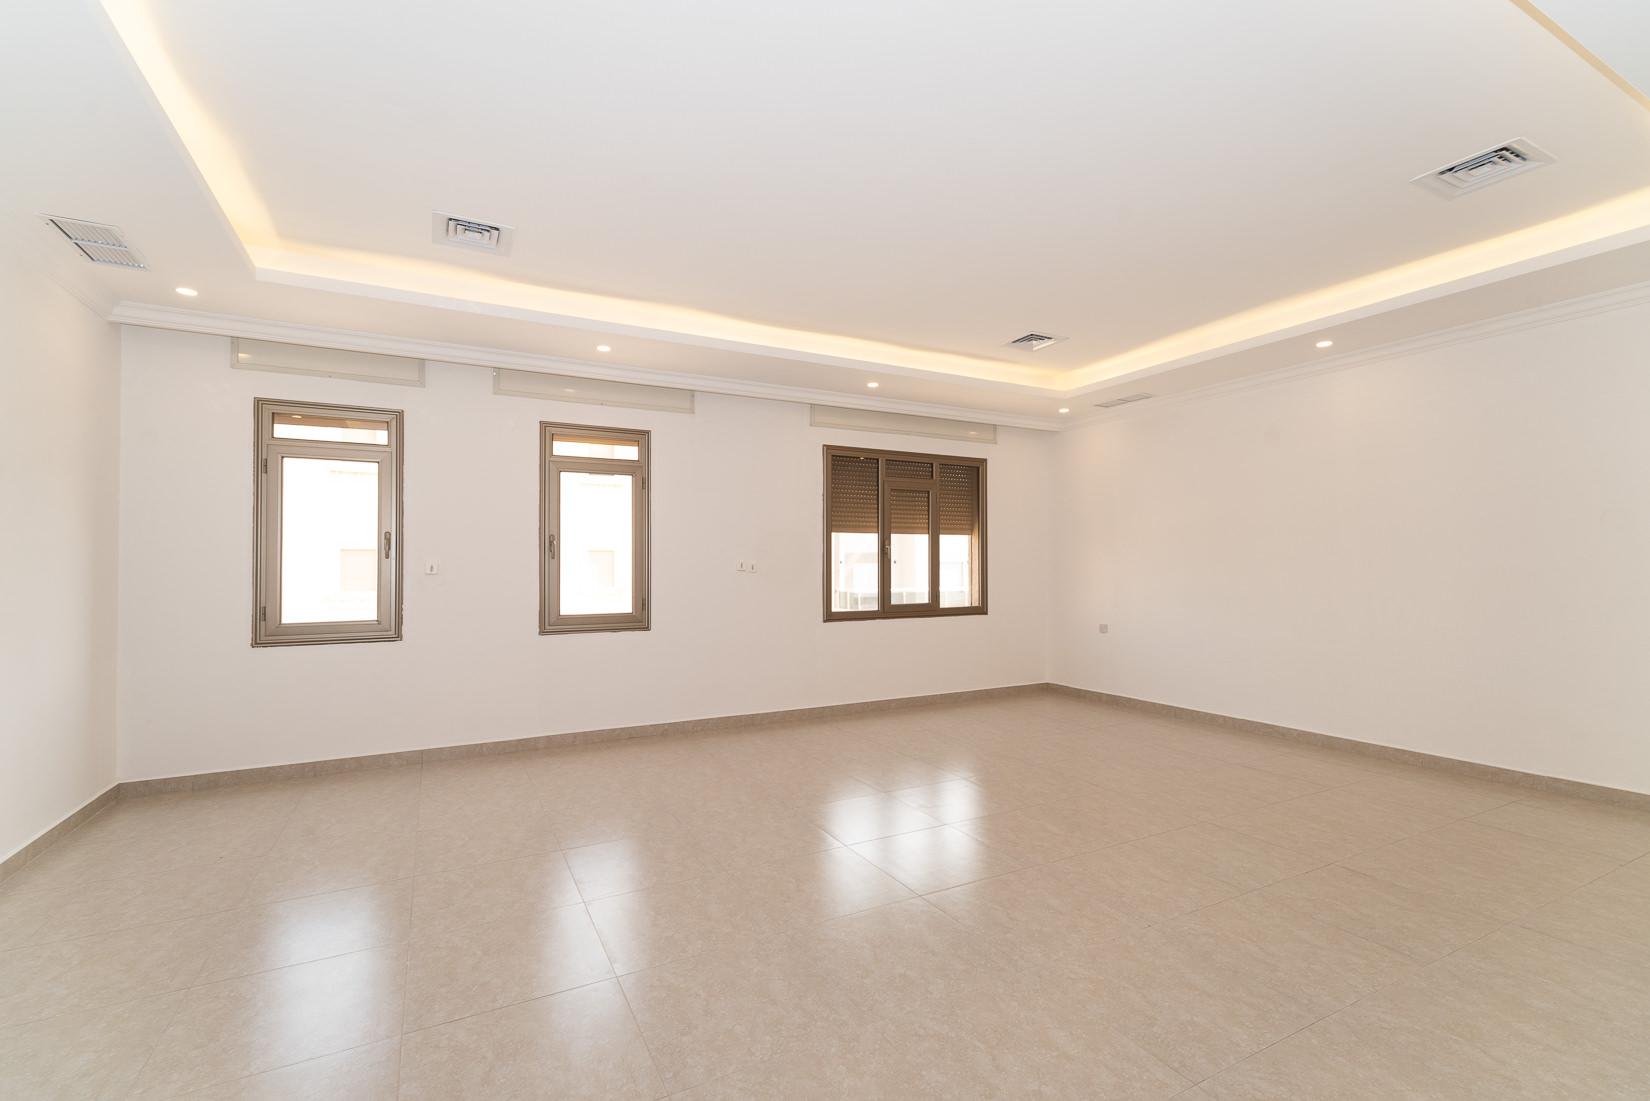 Abu Fatira – new, unfurnished four bedroom floors